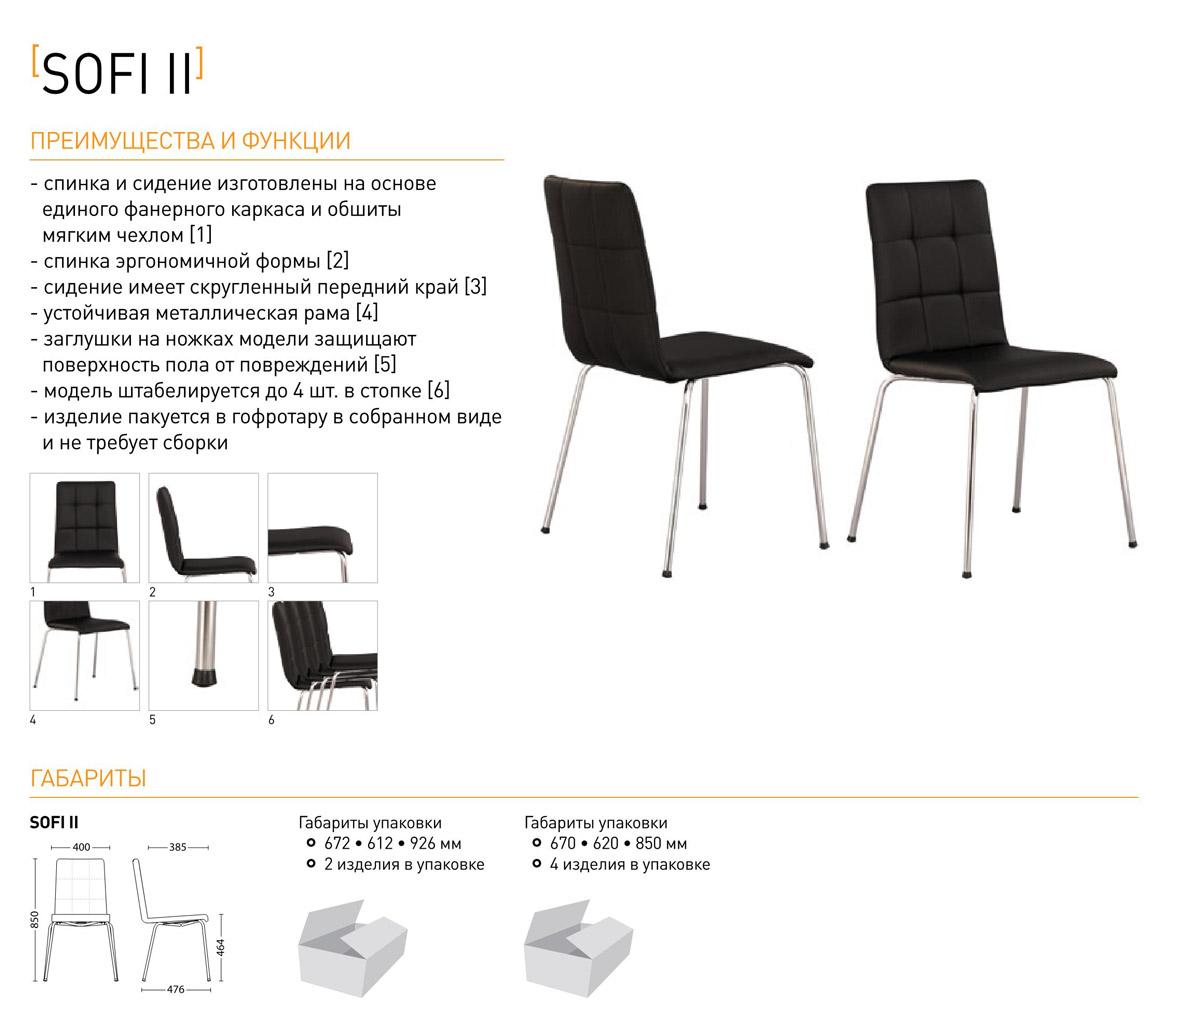 Фото Стул «SOFI II chrome» ECO (Box-2) Nowy styl - sofino.ua